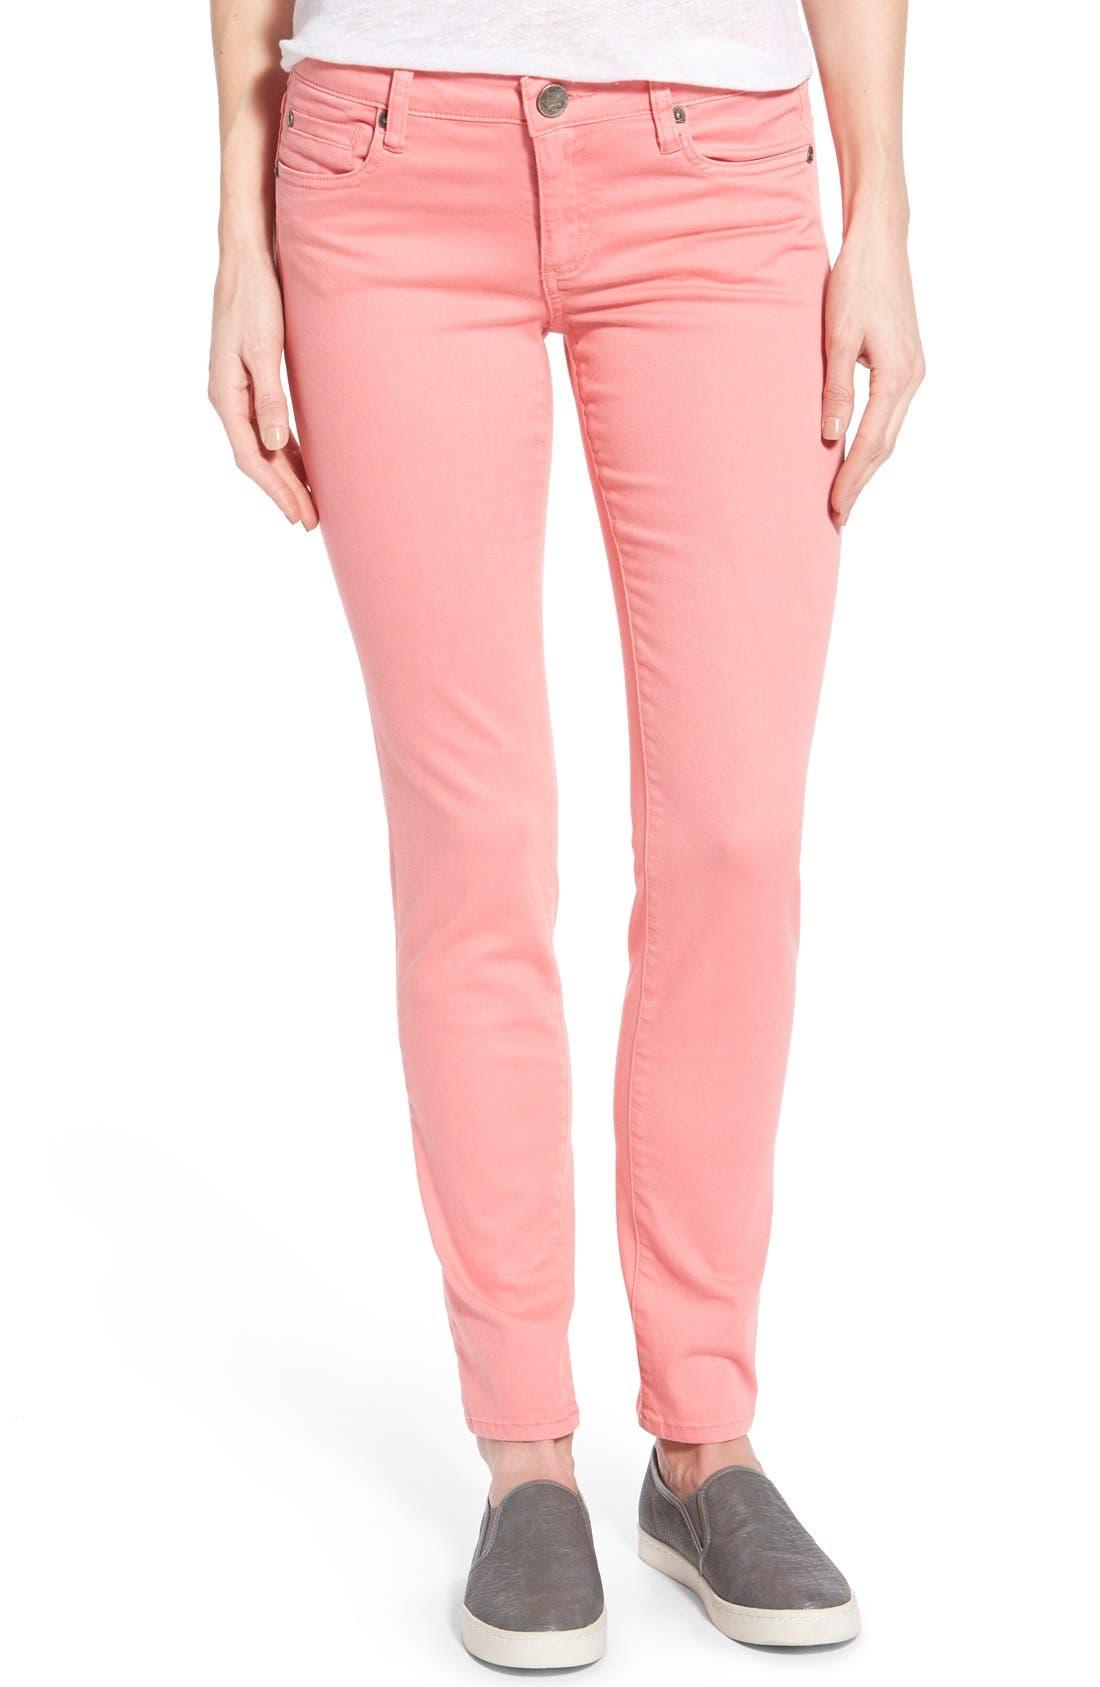 Main Image - KUT from the Kloth 'Diana' Skinny Five-Pocket Pants